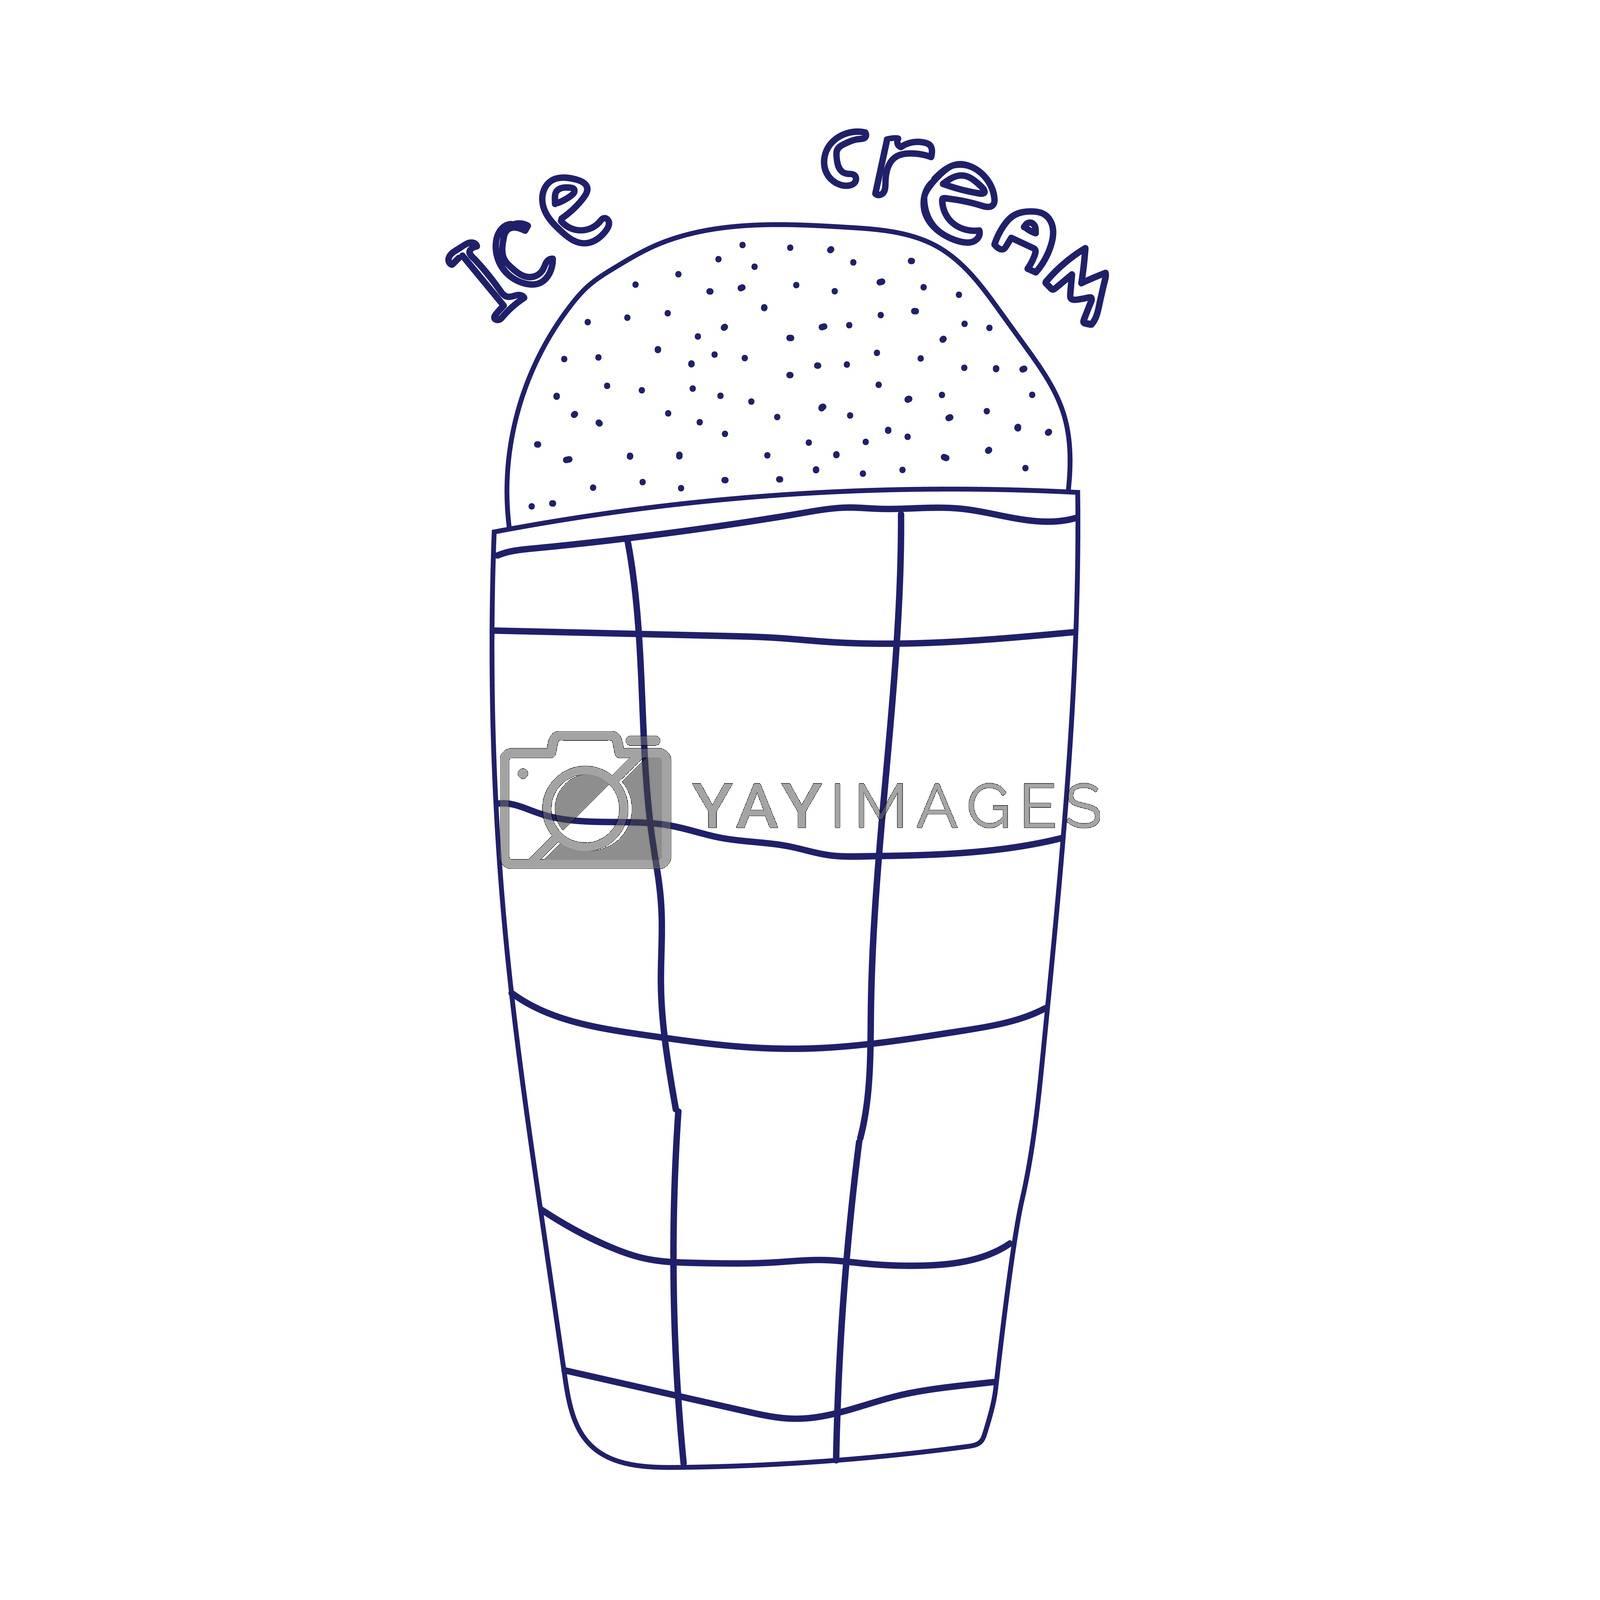 Doodle ice cream cone frozen dessert style sketch in format.